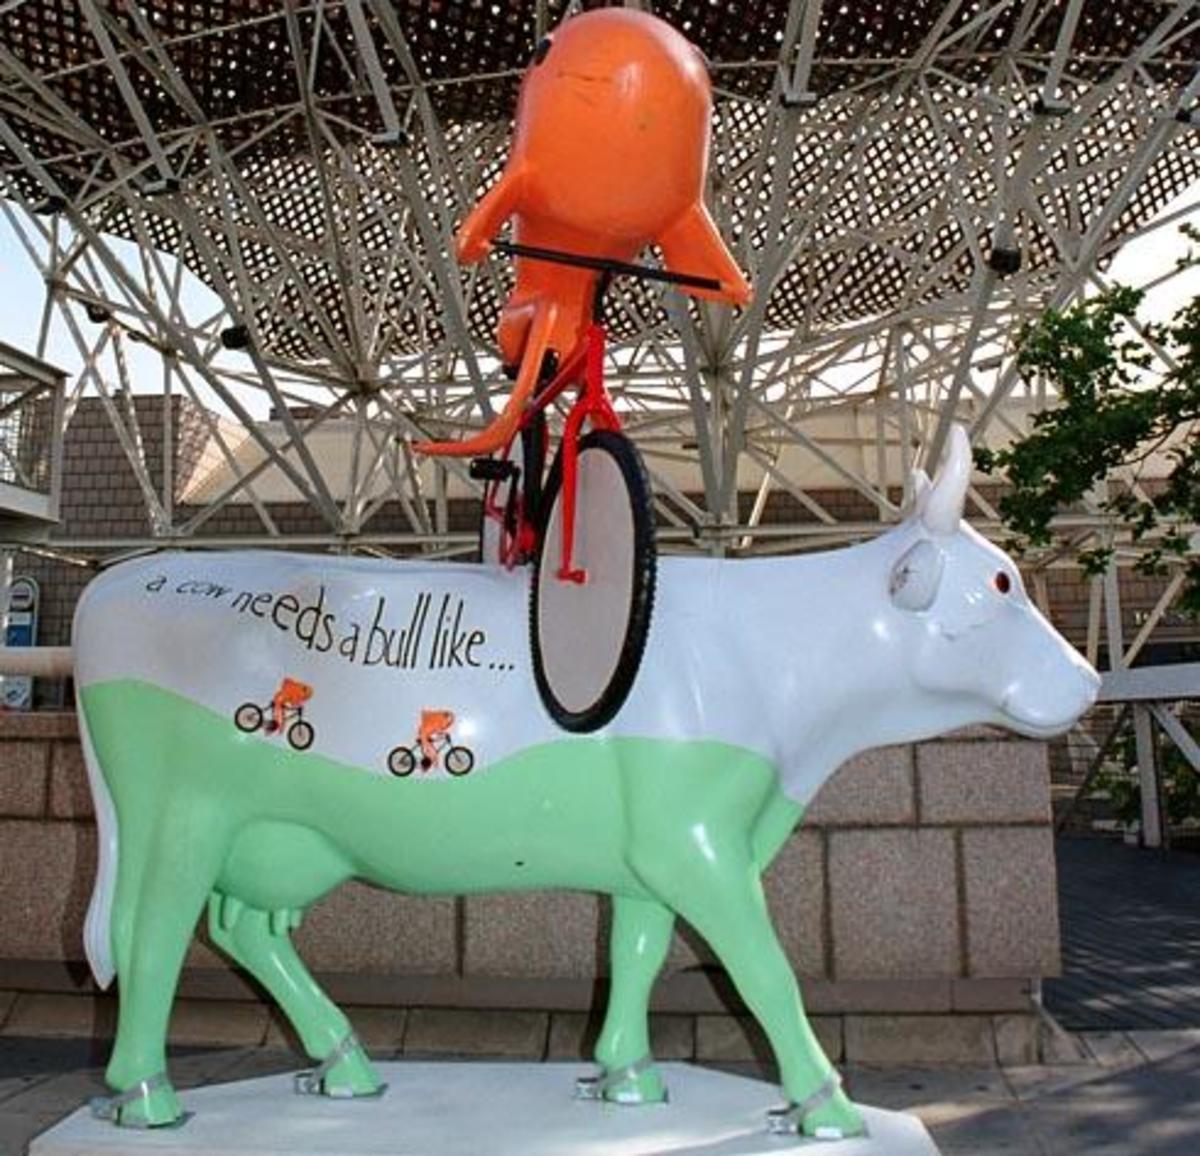 A cow needs a bull like a fish needs a bycicle (Barcelona)